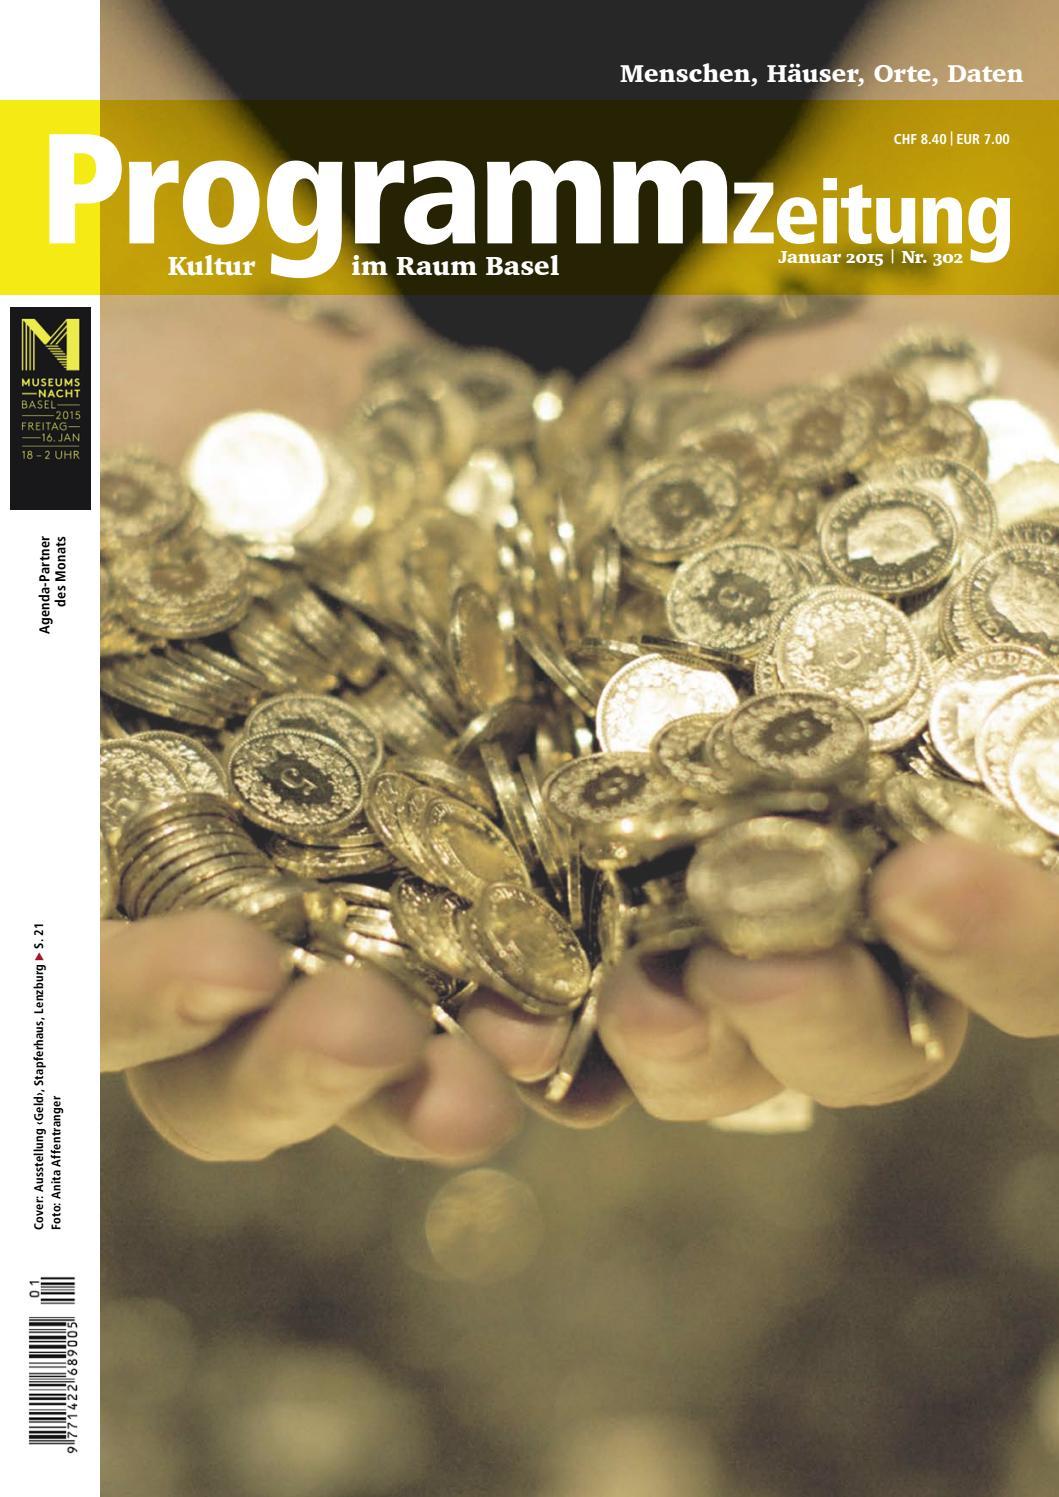 Programmzeitung Januar 2015 By Programmzeitung Issuu